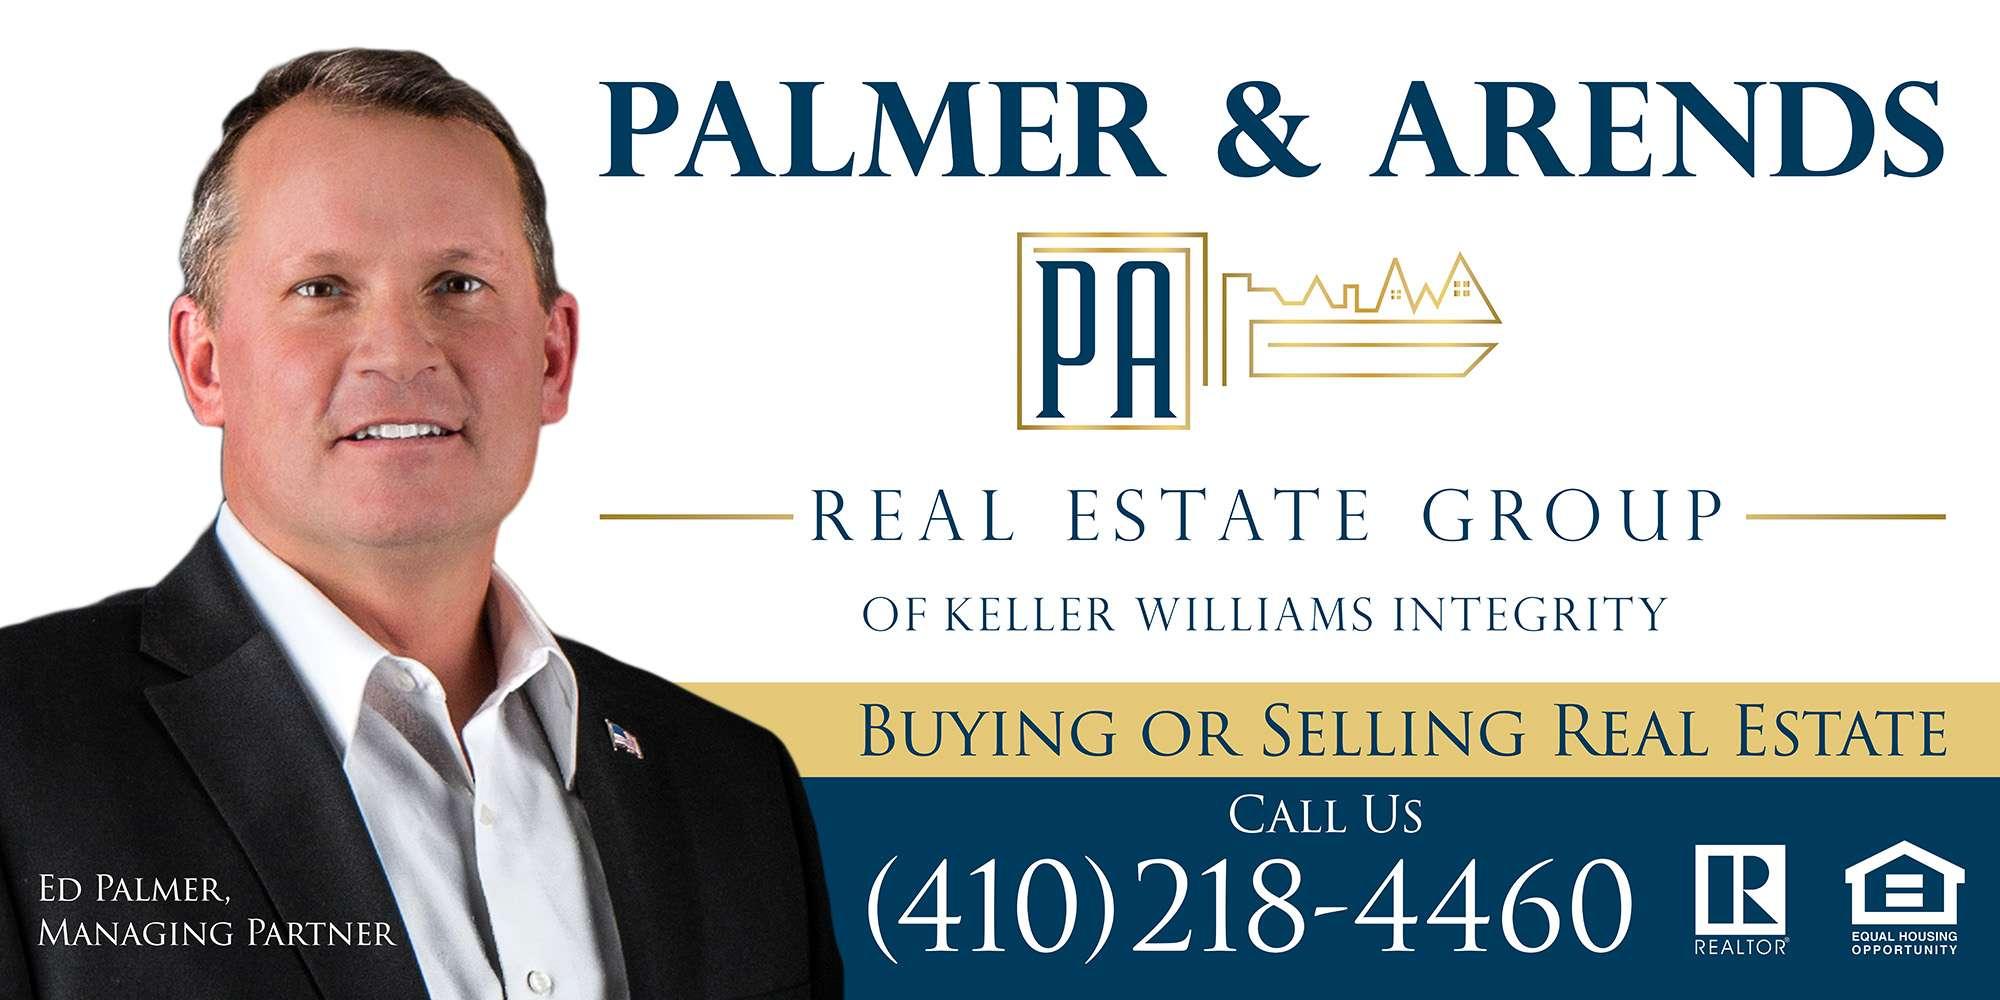 Palmer & Arends REV.jpg